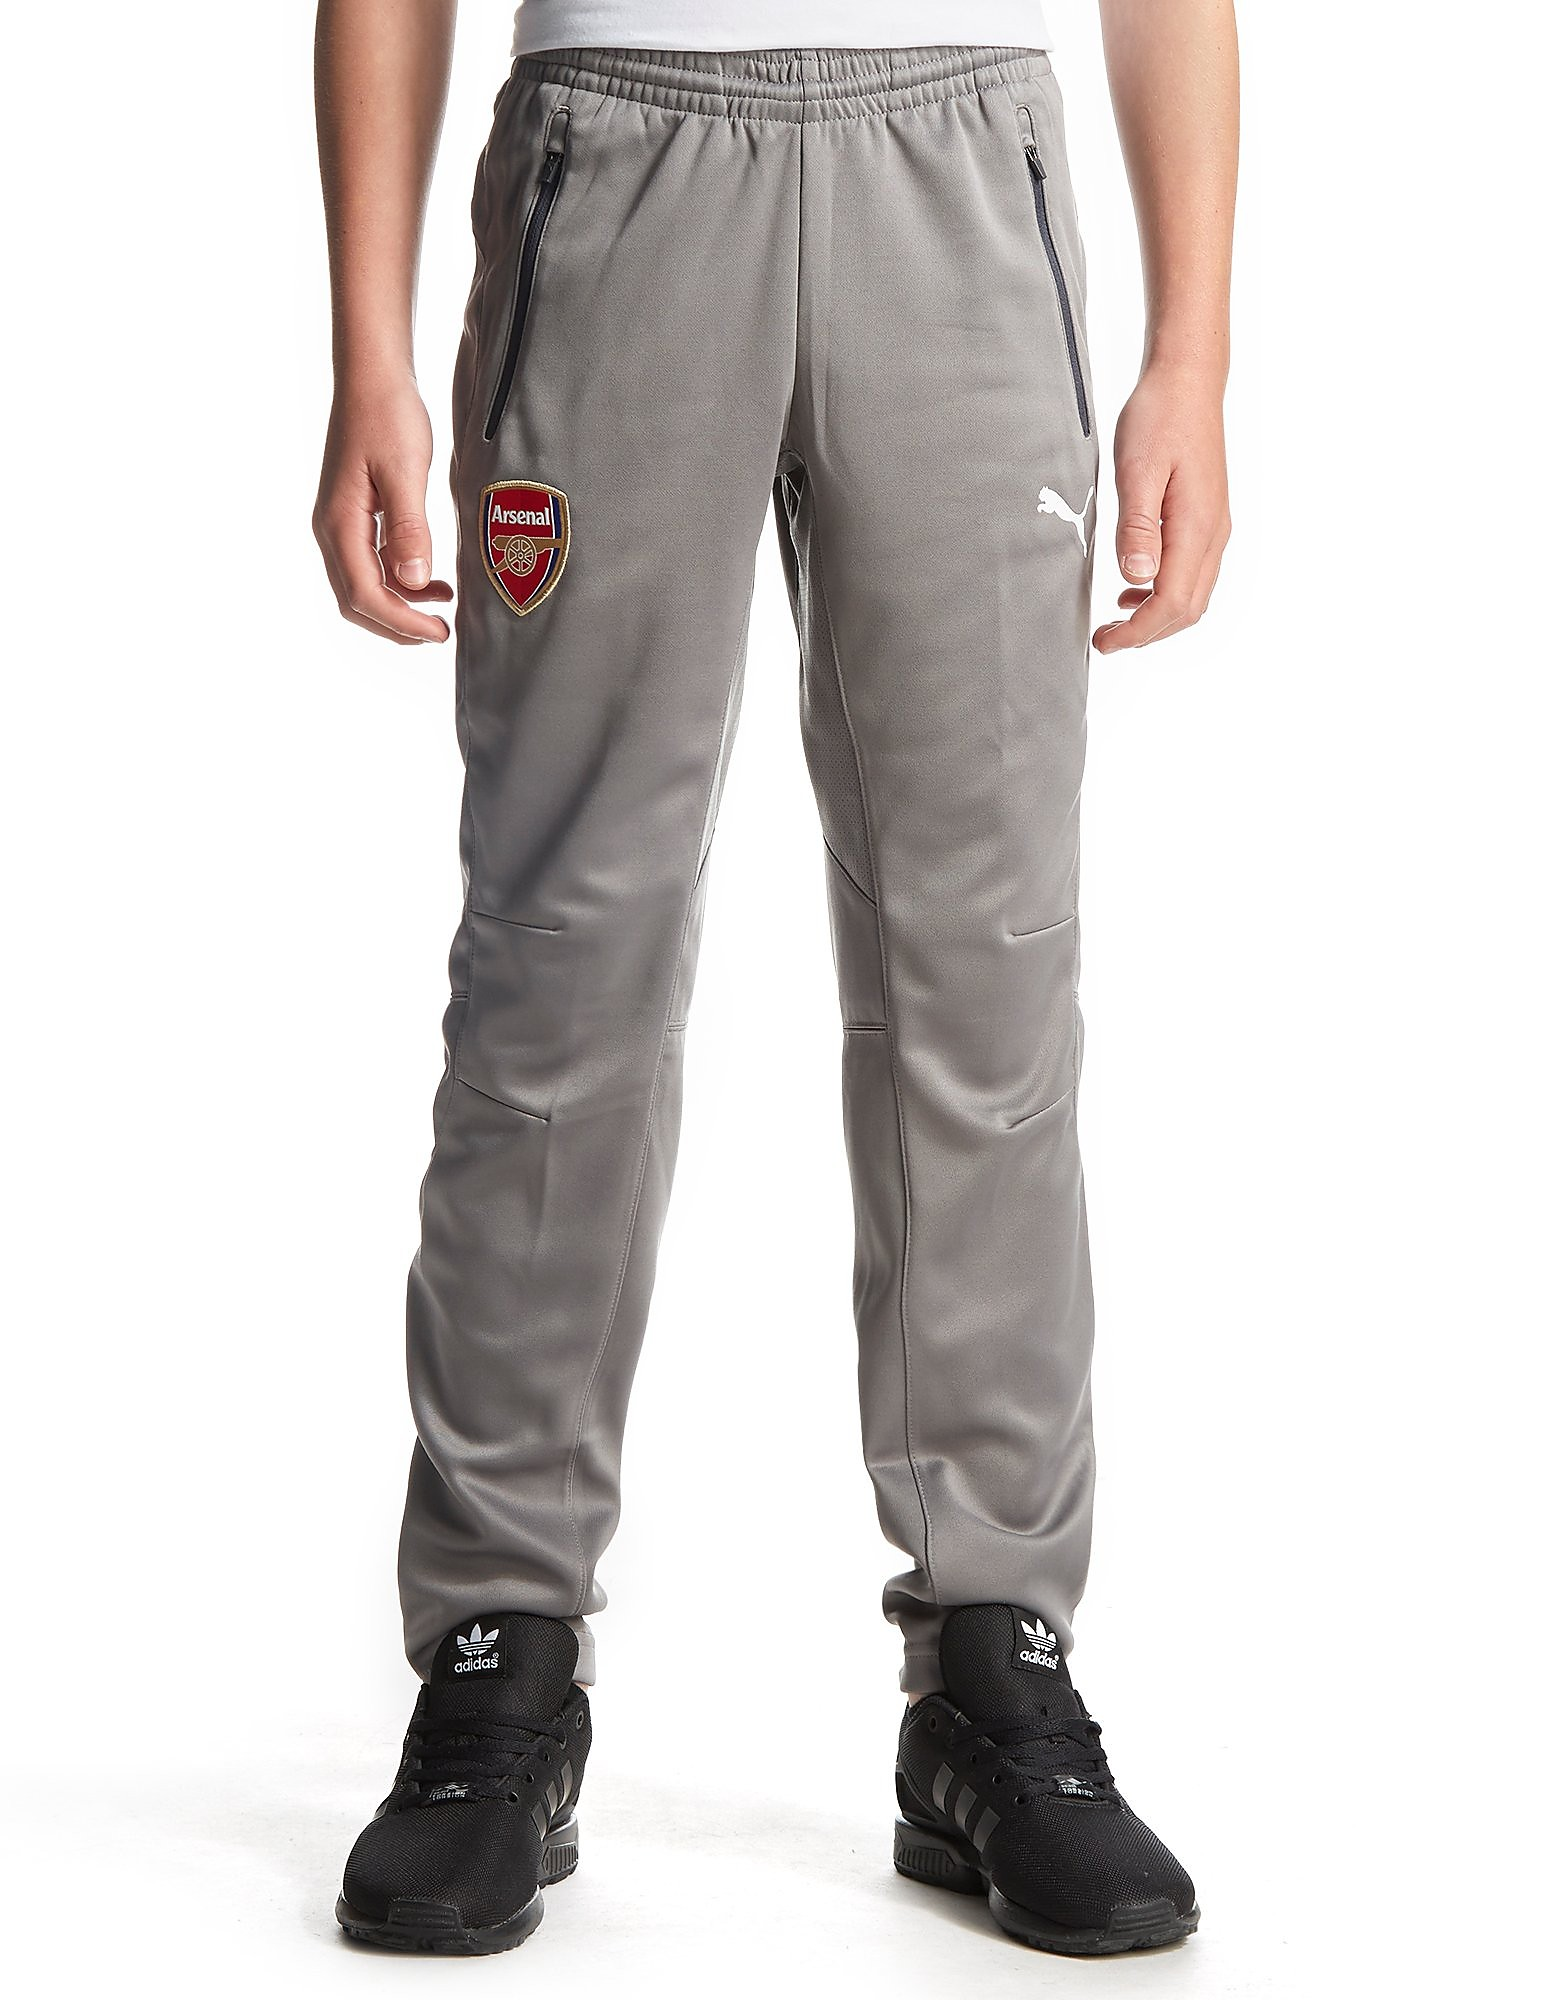 PUMA Arsenal FC 2016/17 Training Pants Junior